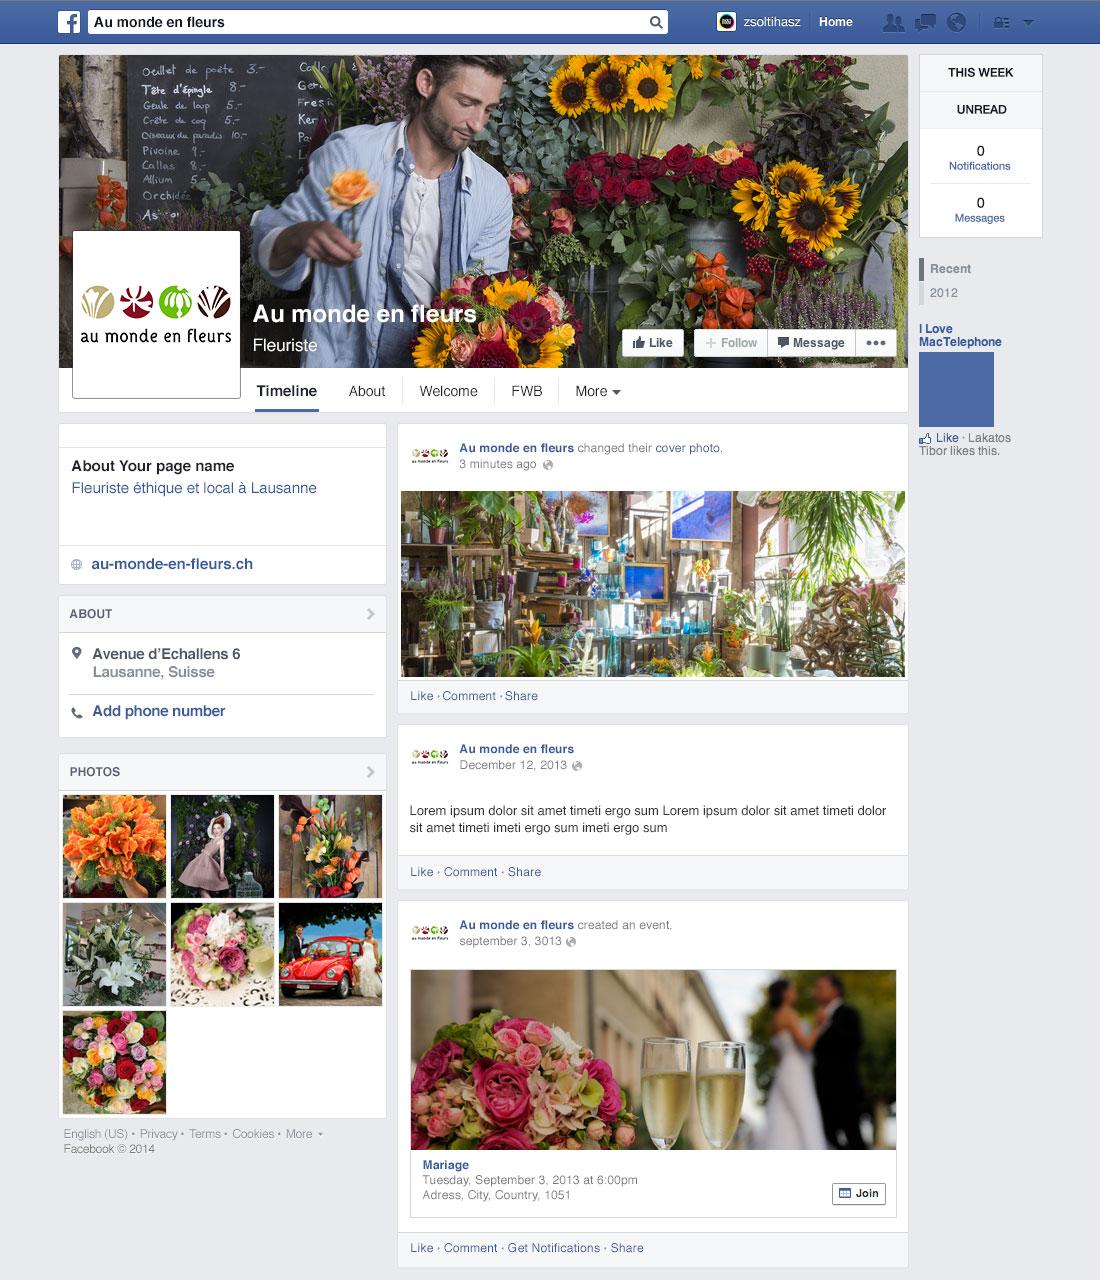 Au monde en fleurs - Page Facebook$